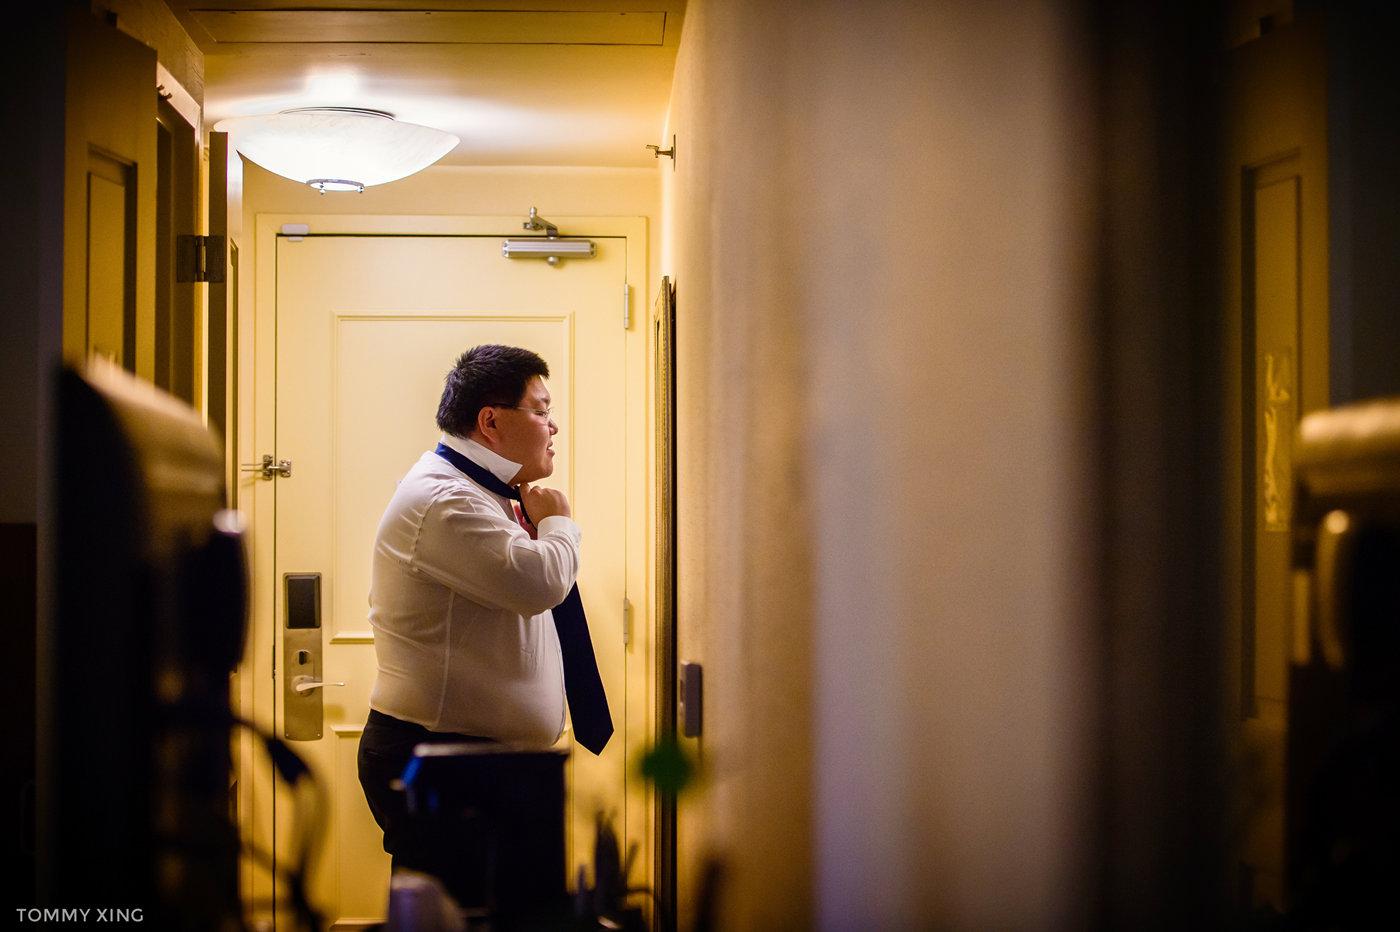 STANFORD MEMORIAL CHURCH WEDDING - Wenjie & Chengcheng - SAN FRANCISCO BAY AREA 斯坦福教堂婚礼跟拍 - 洛杉矶婚礼婚纱照摄影师 Tommy Xing Photography025.jpg